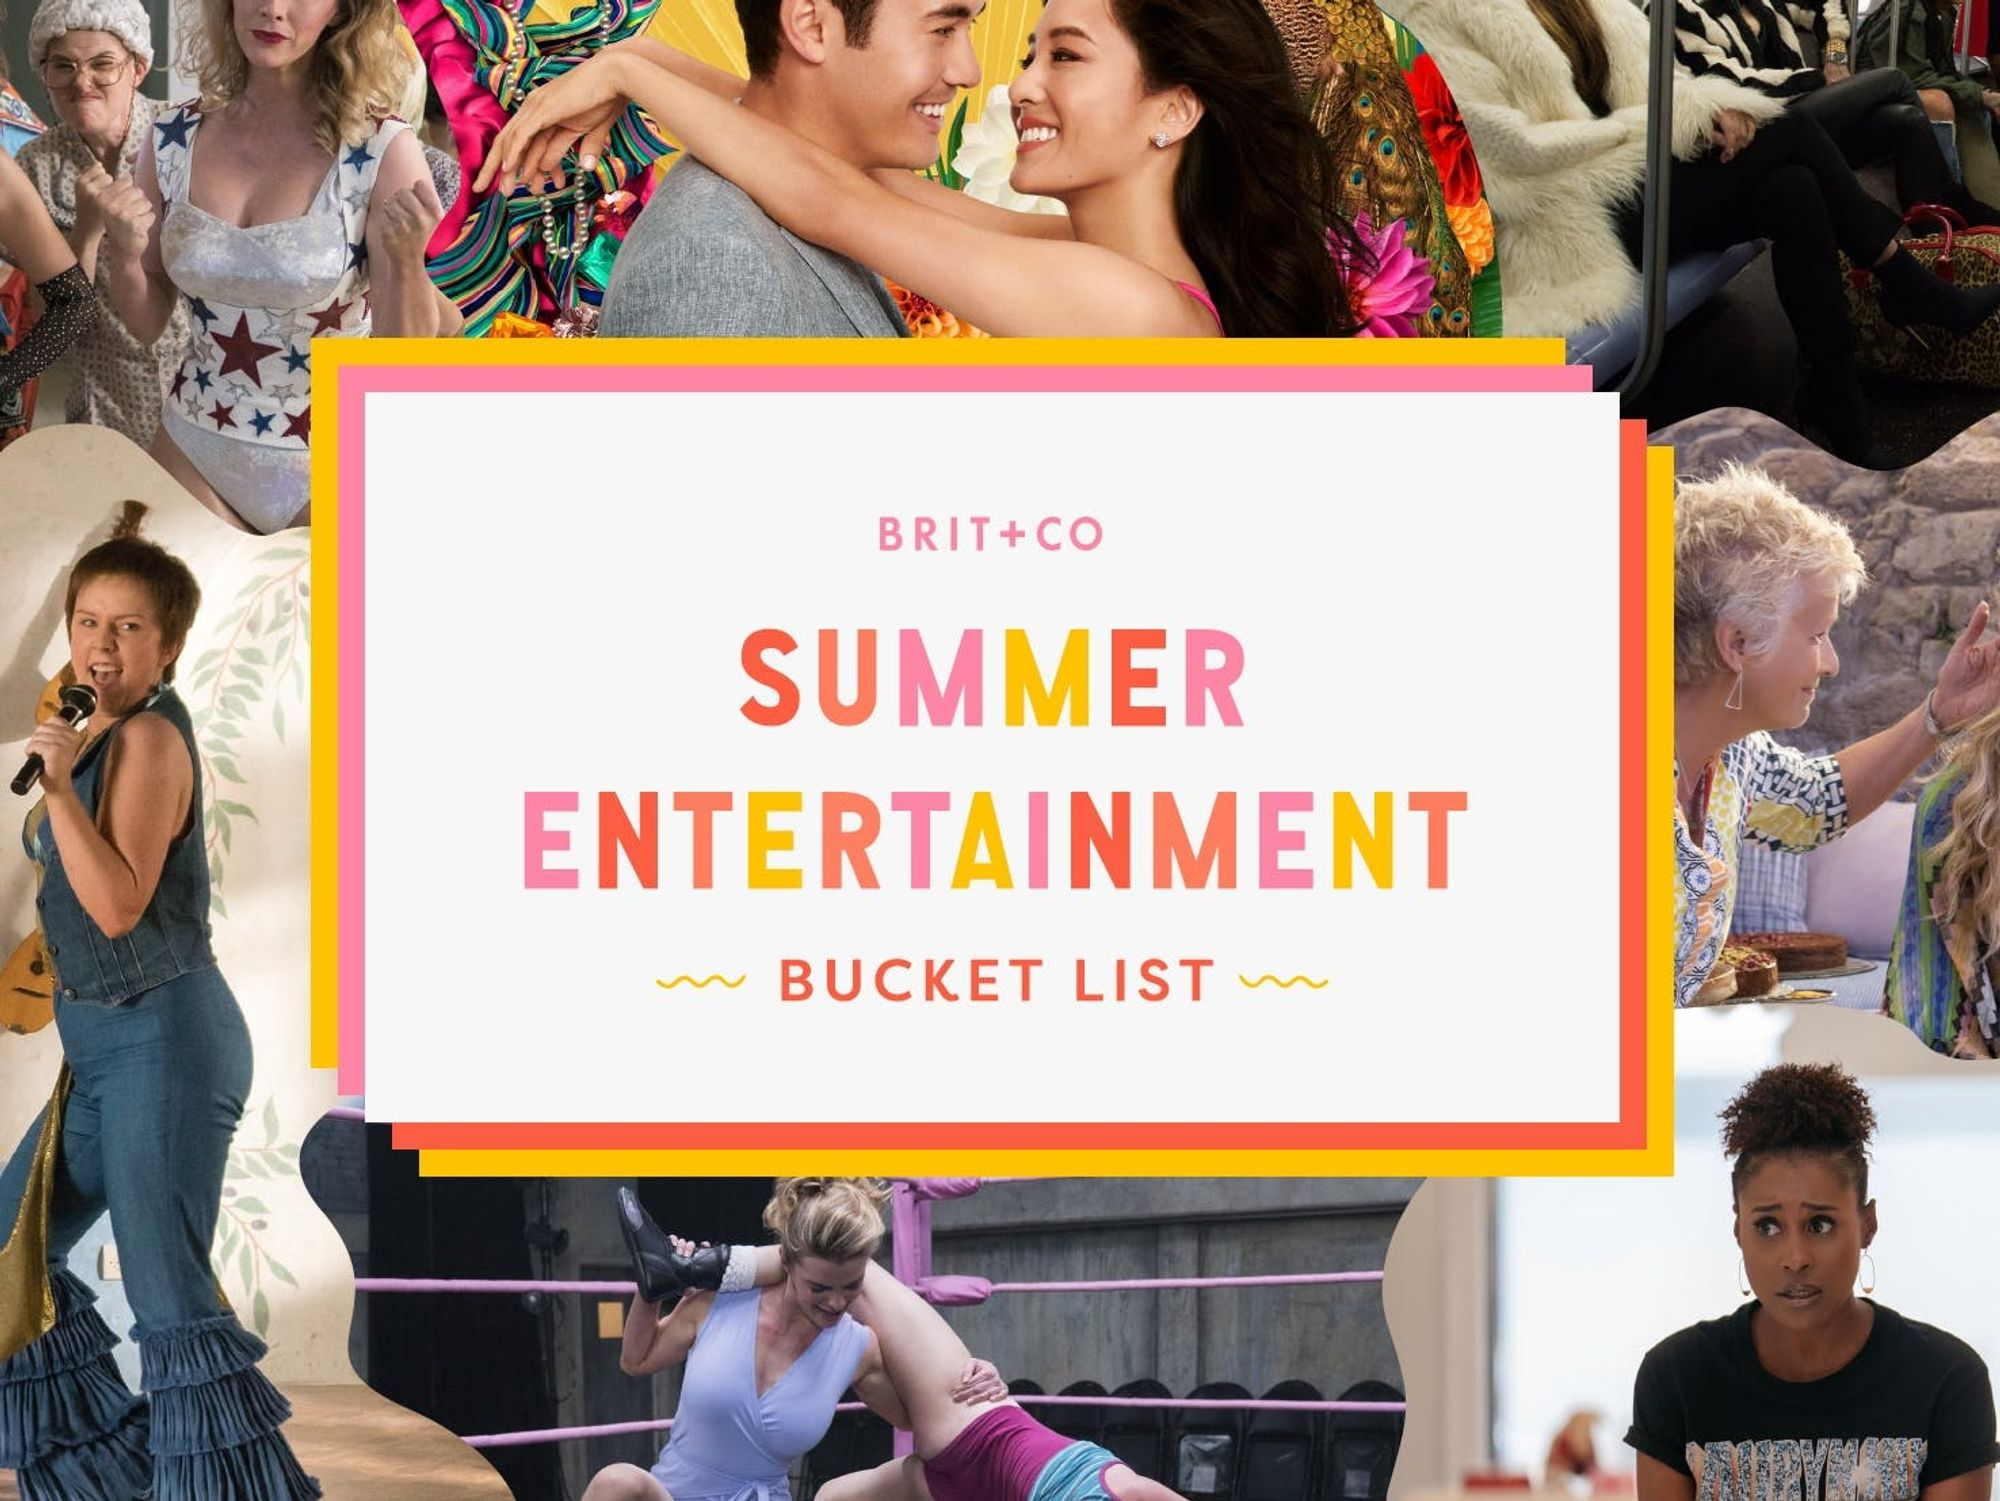 Brit + Co's Summer Entertainment Bucket List